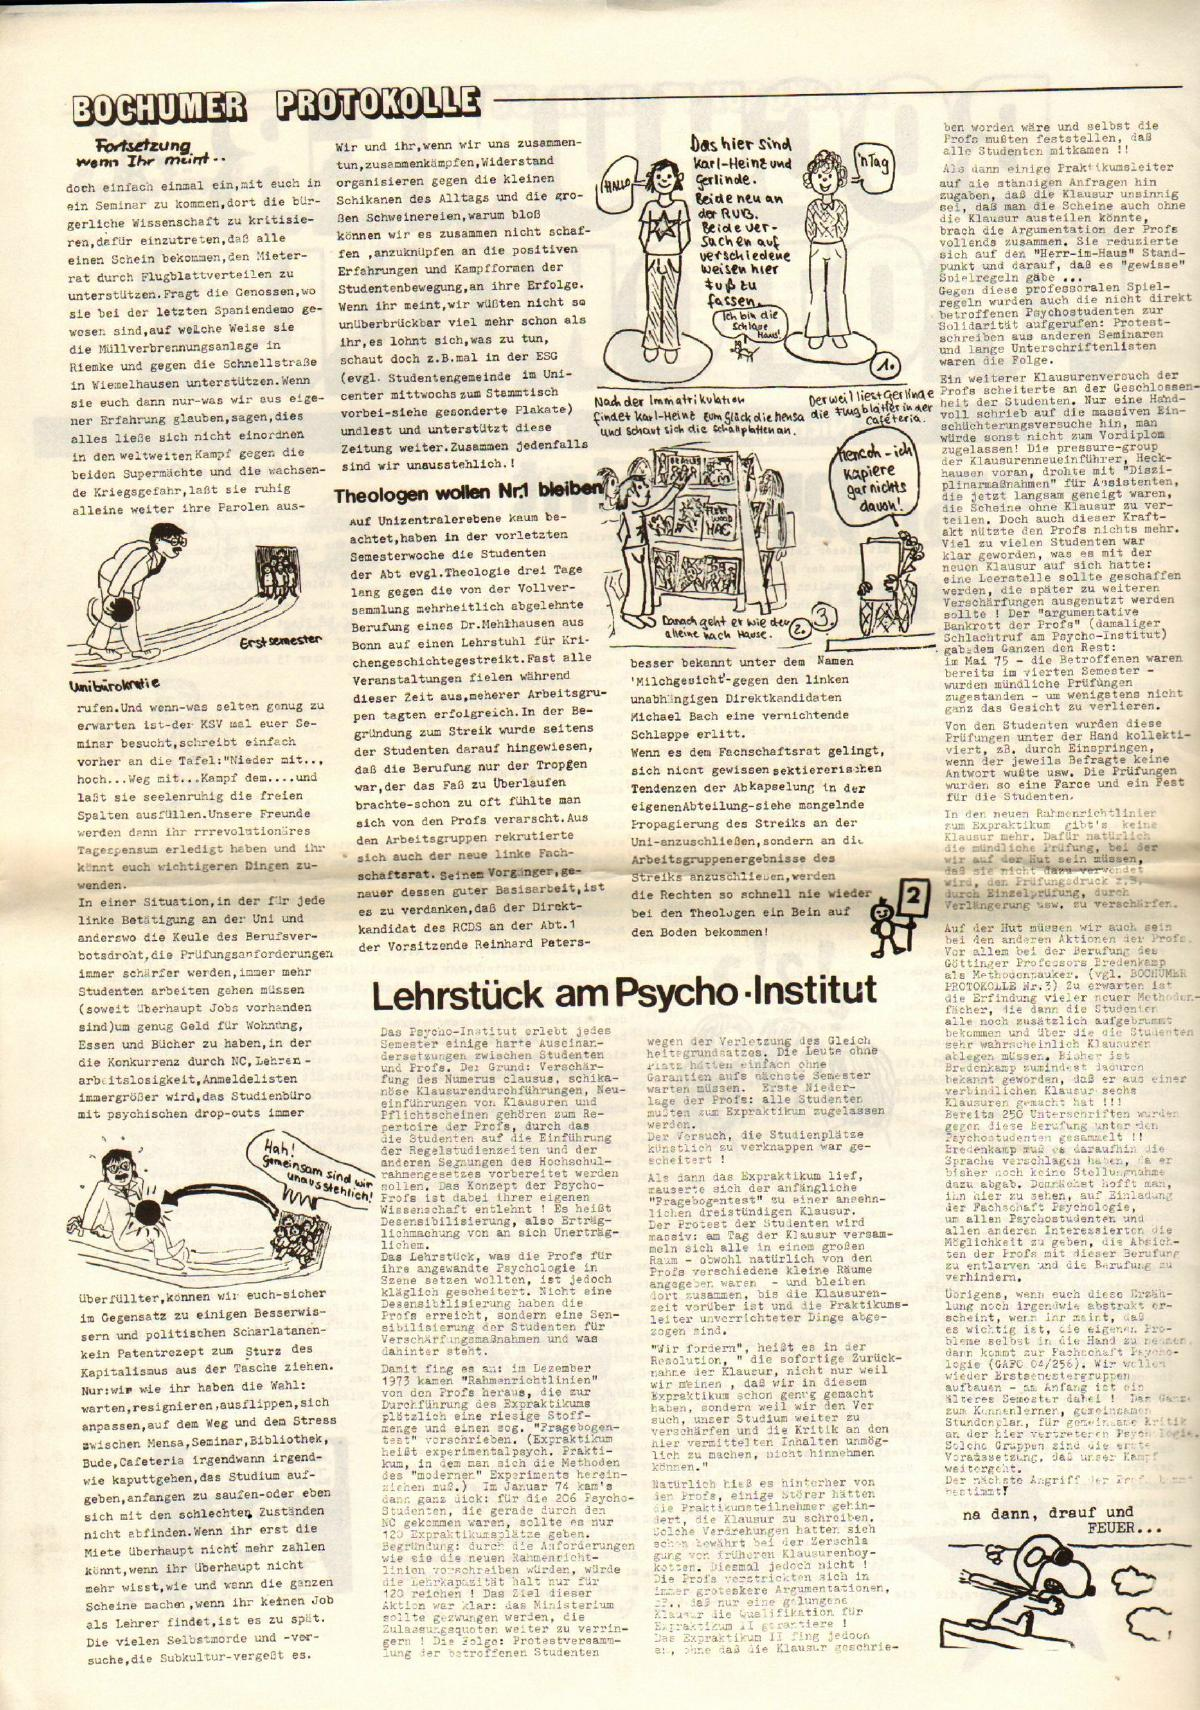 Bochumer_Protokolle_19751000_002